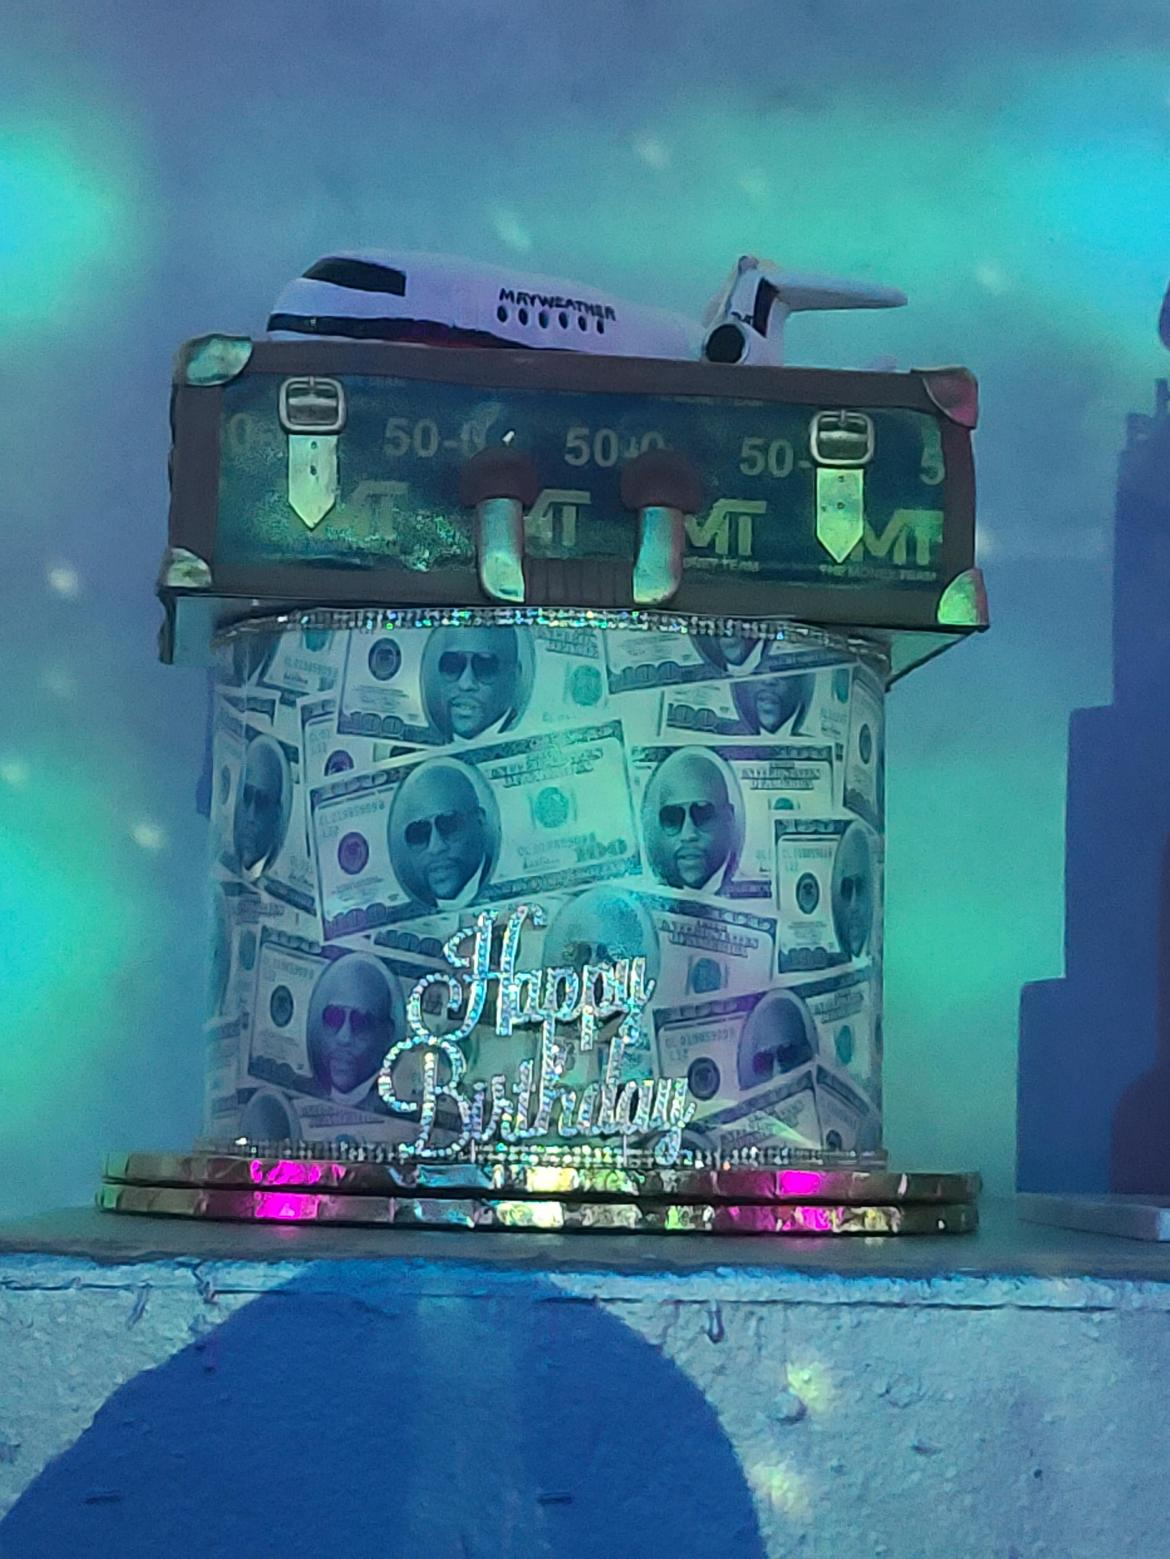 Floyd Mayweather's custom birthday cake